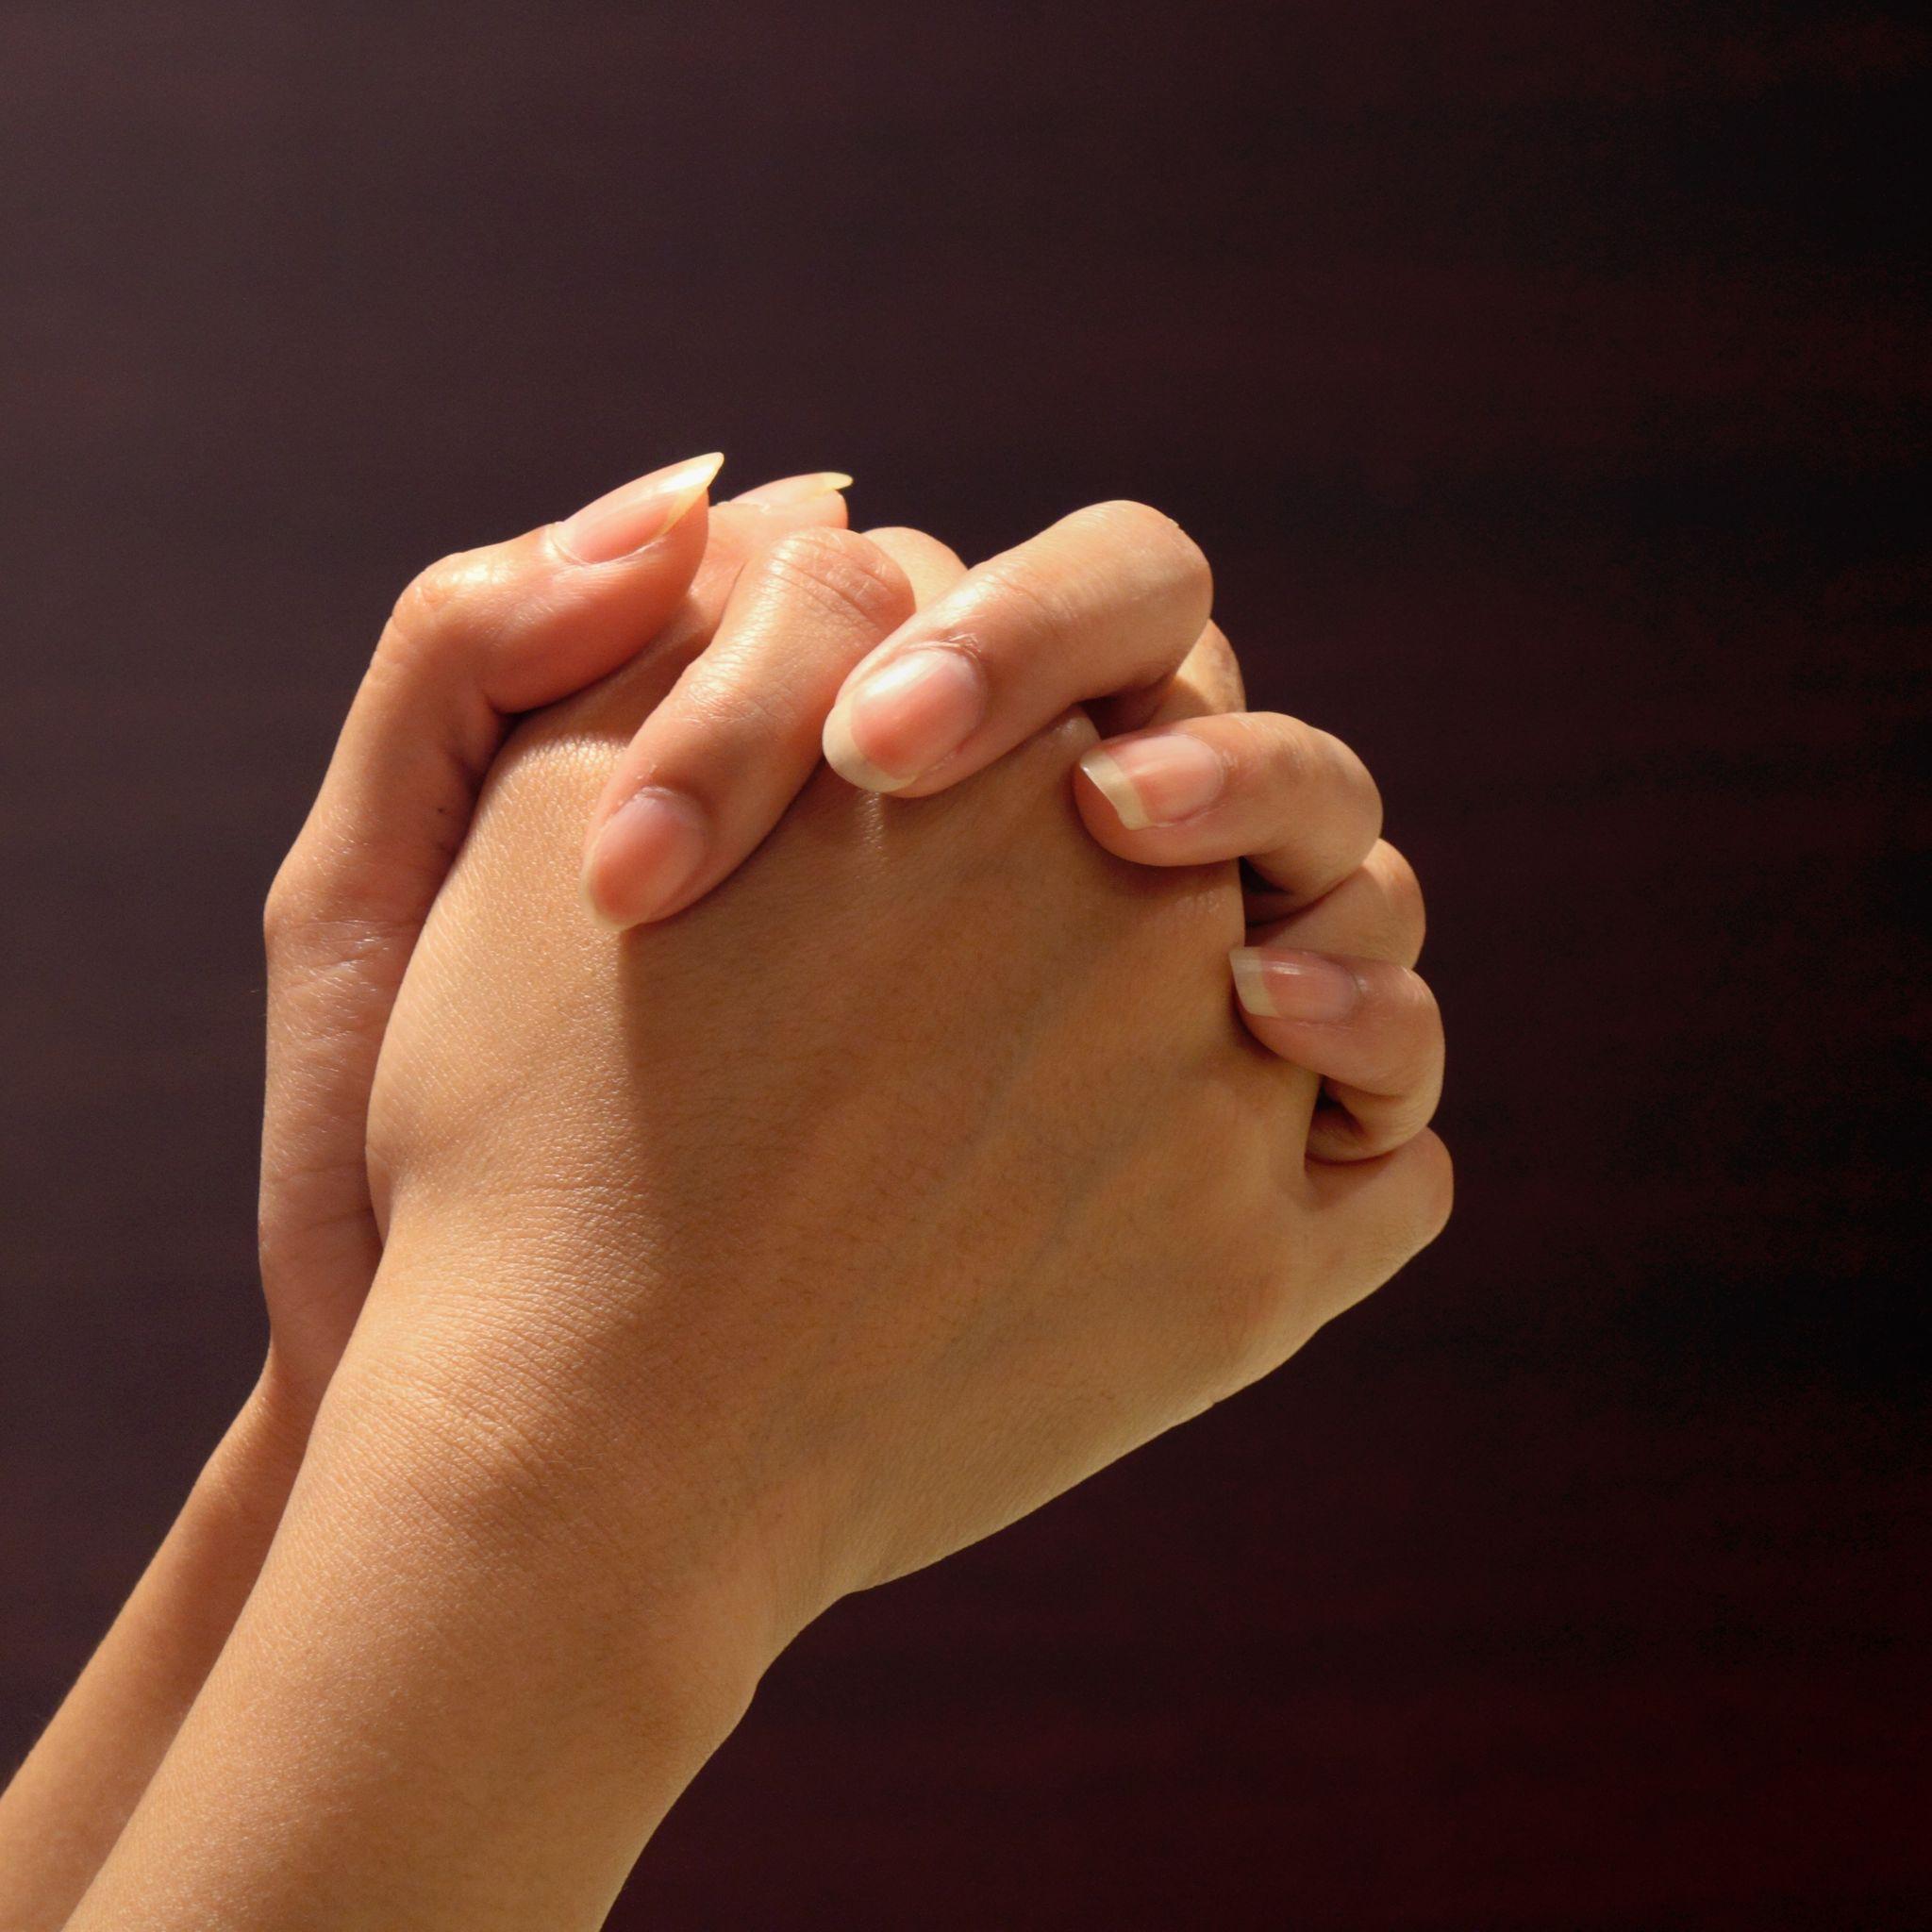 Gods clipart two hand Free Hill Church Art Clip